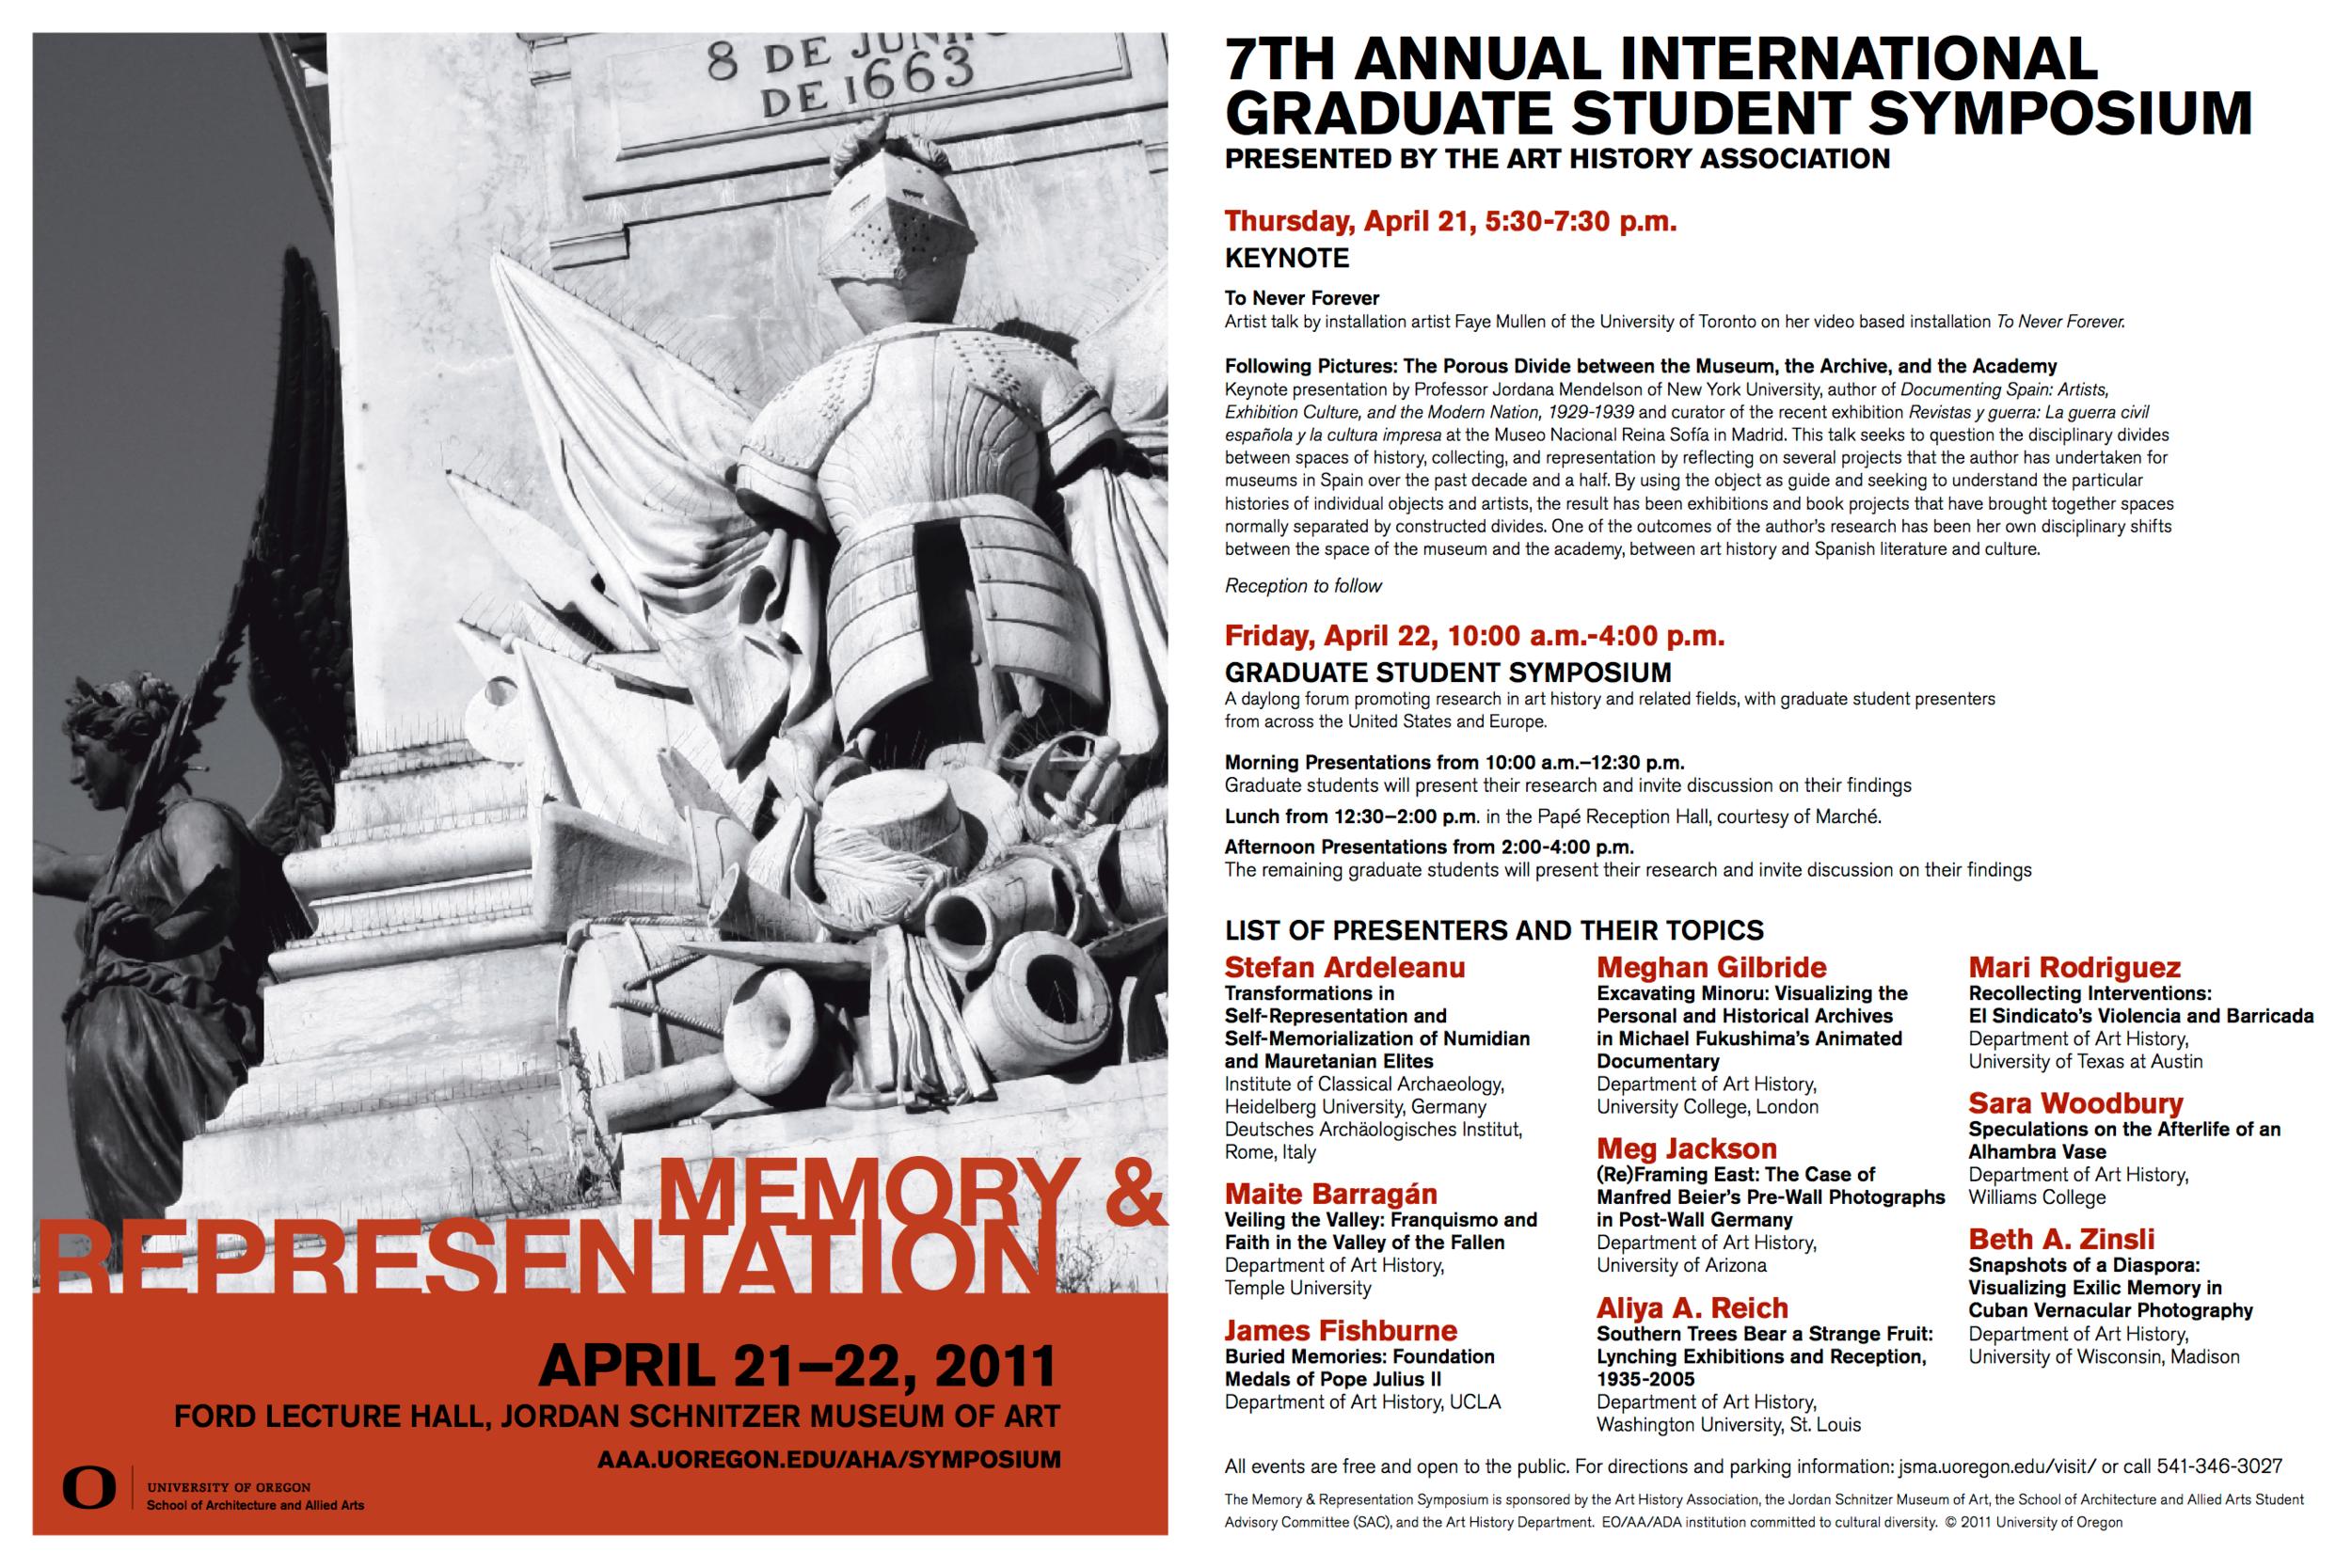 Symposium brochure, University of Oregon, 2011.